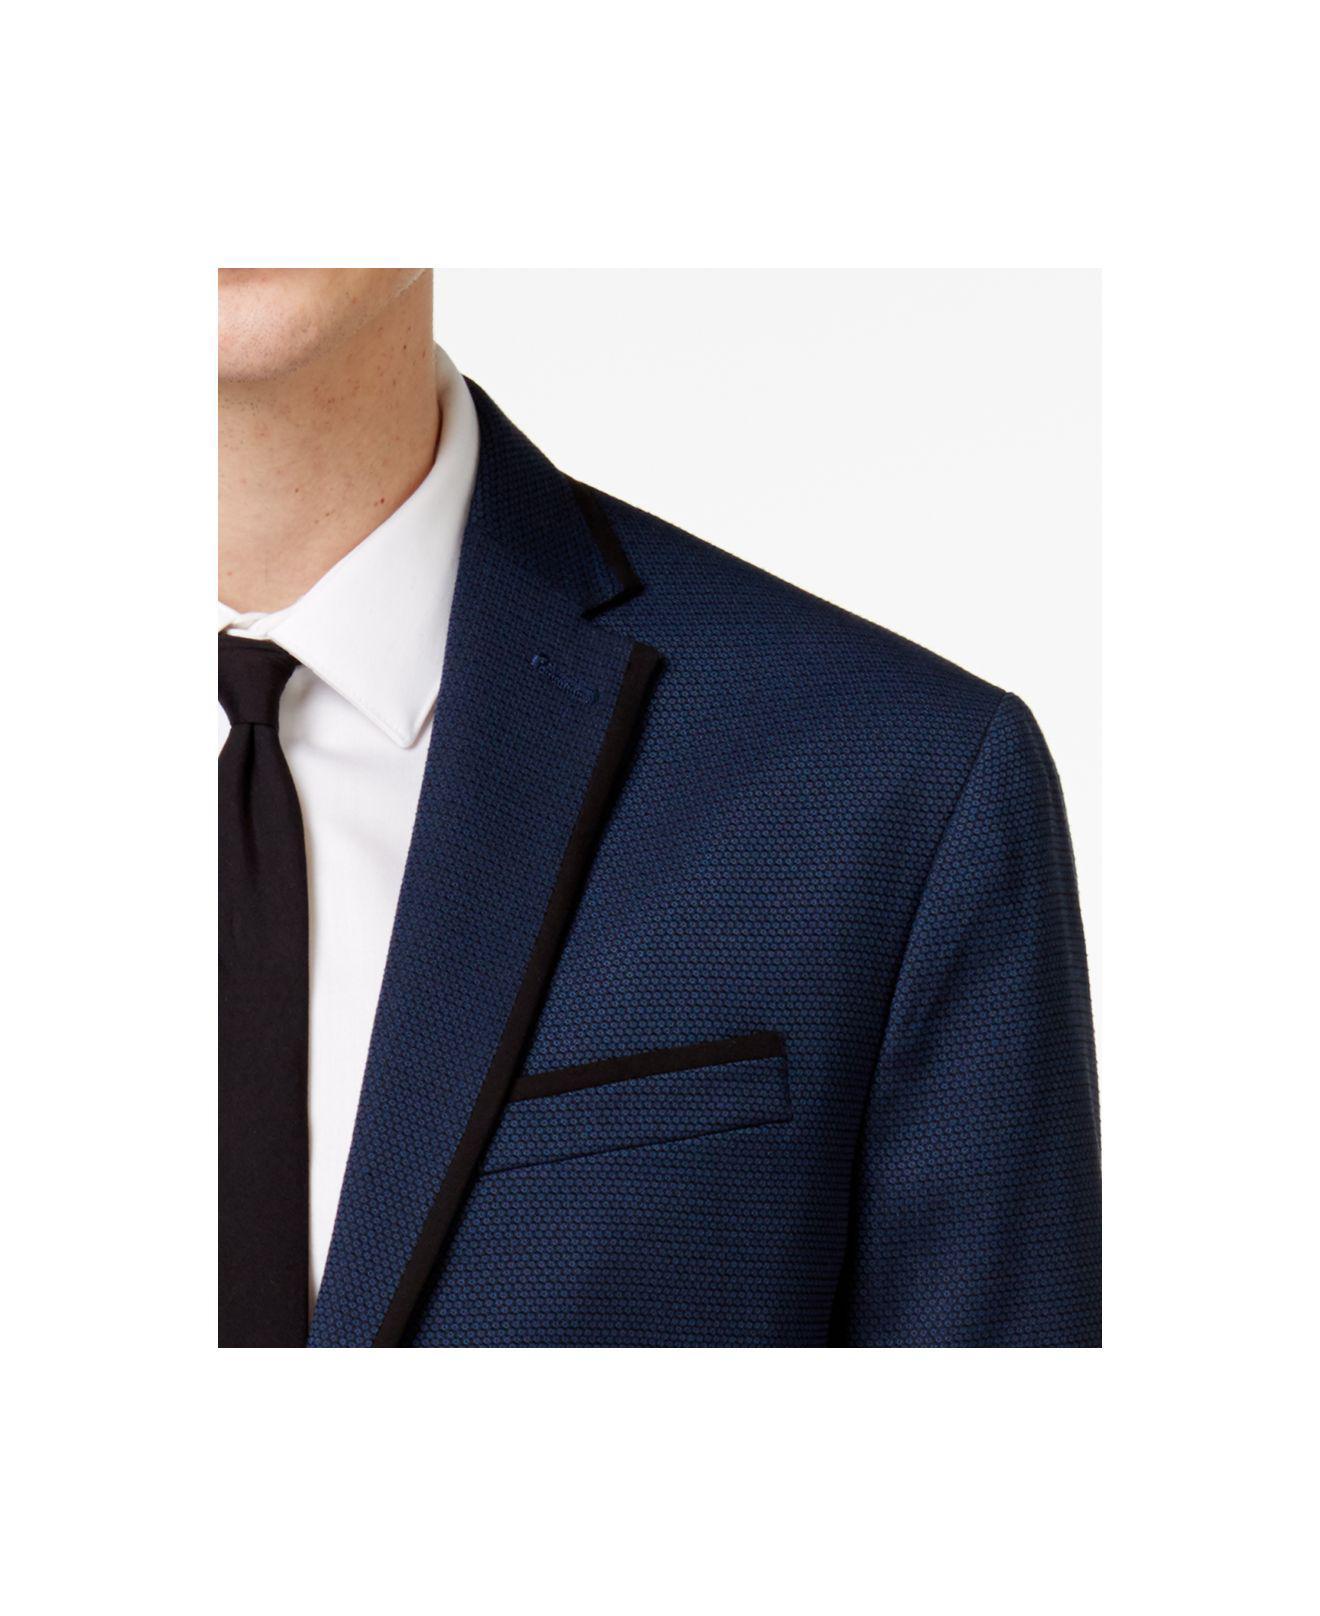 Lyst - Kenneth Cole Reaction Men s Slim-fit Blue Birdseye Dinner Jacket in  Blue for Men ce953c0f7